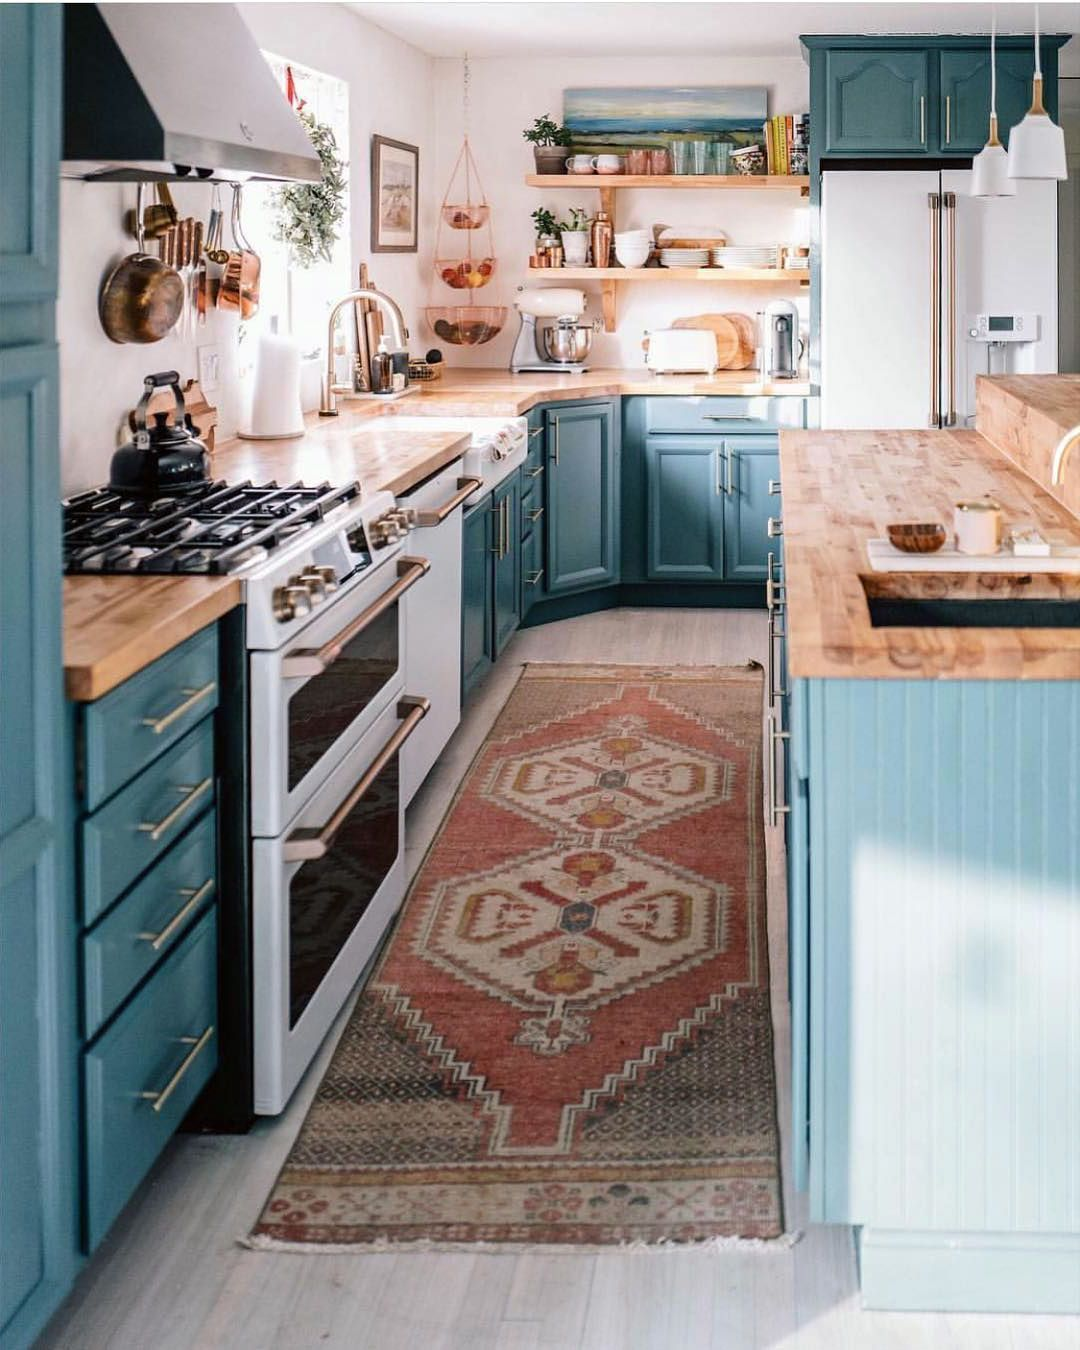 108 Cute Boho Scandinavian Design Ideas For Your Minimalist Kitchen